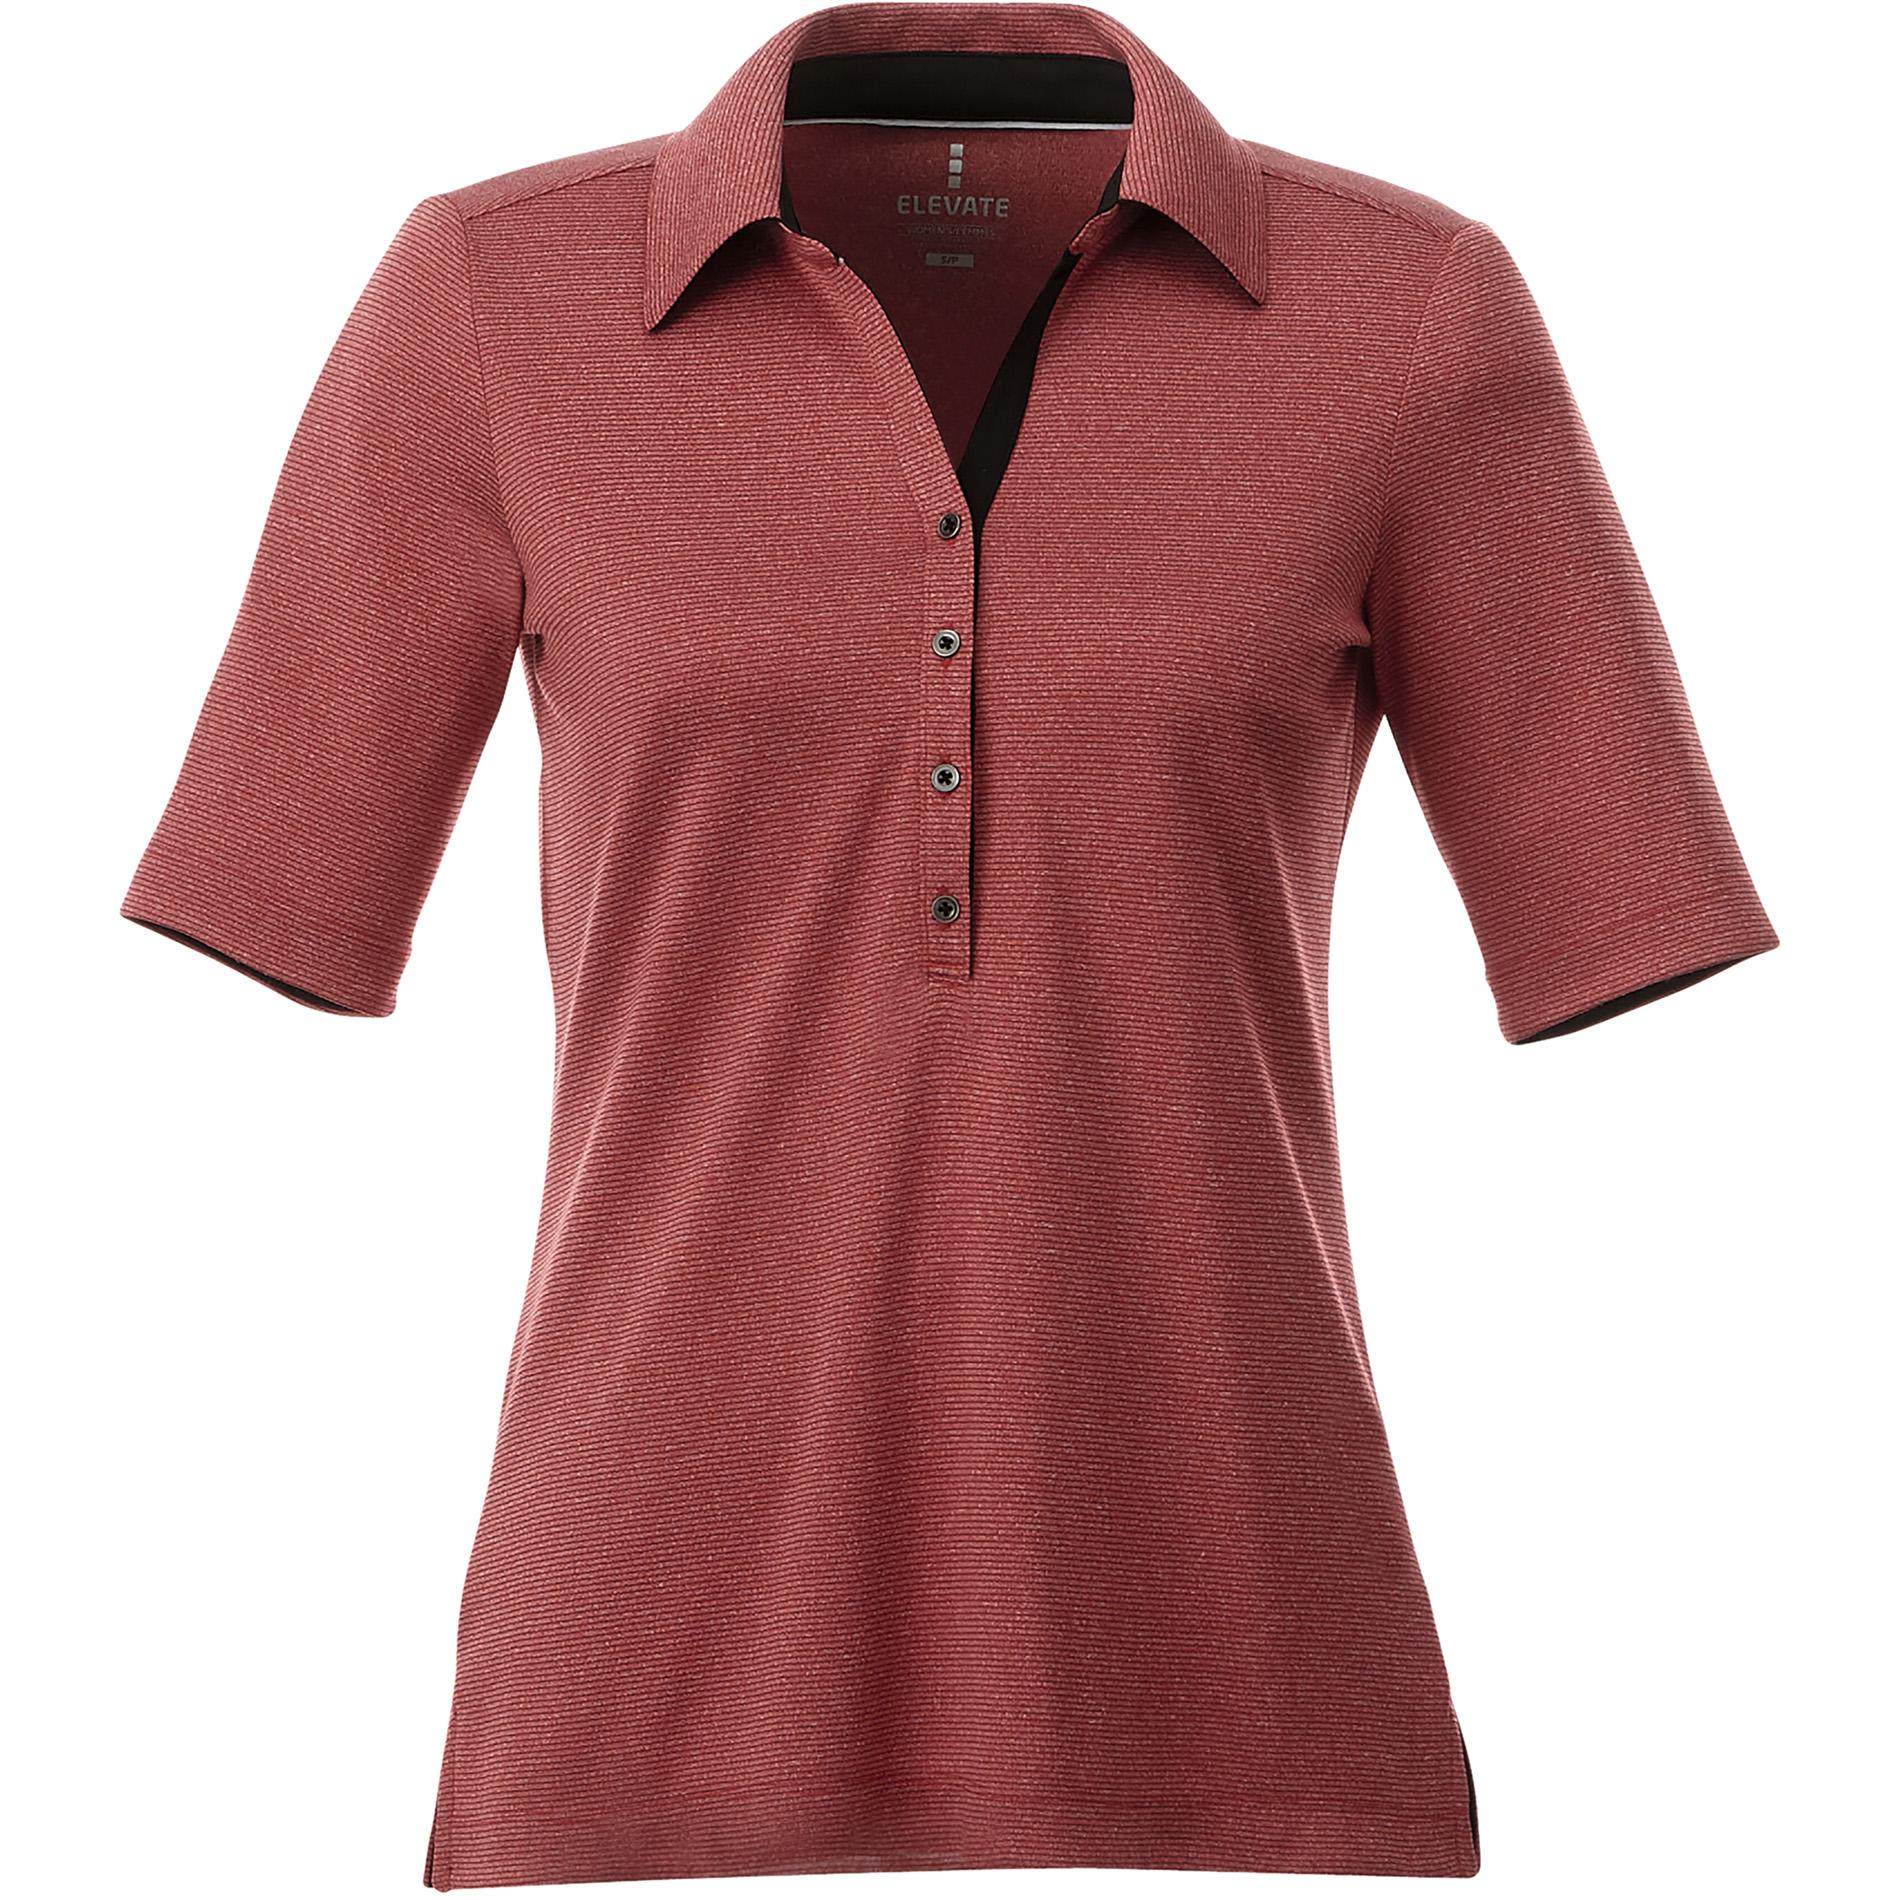 Elevate TM96705 - Women's Skara SS Polo